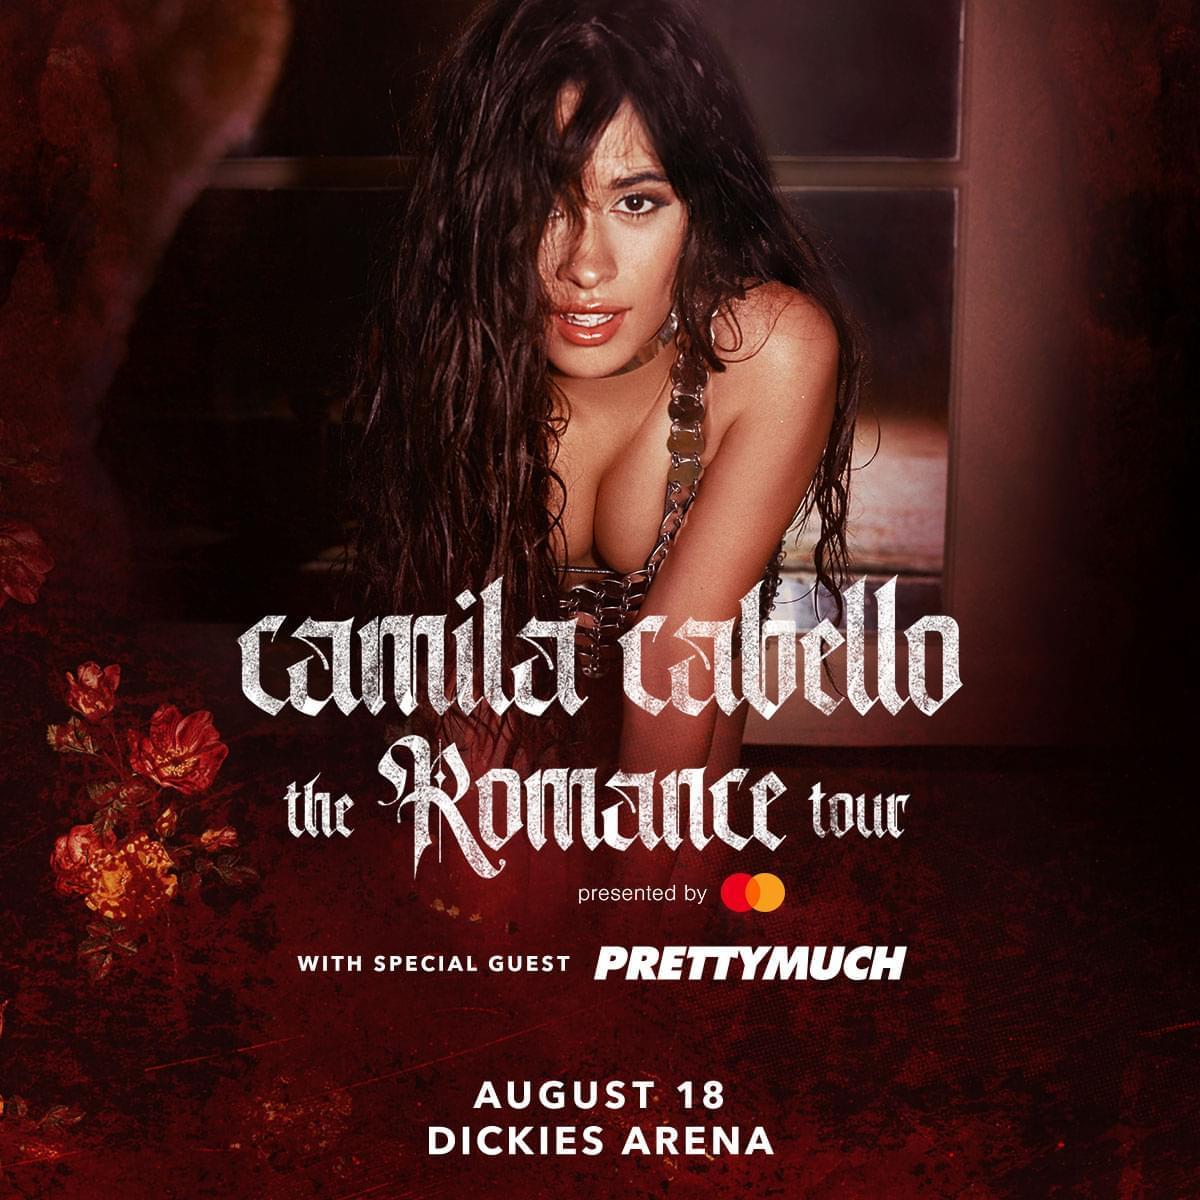 Camila Cabello @ Dickies Arena | 8.18.20 – POSTPONED